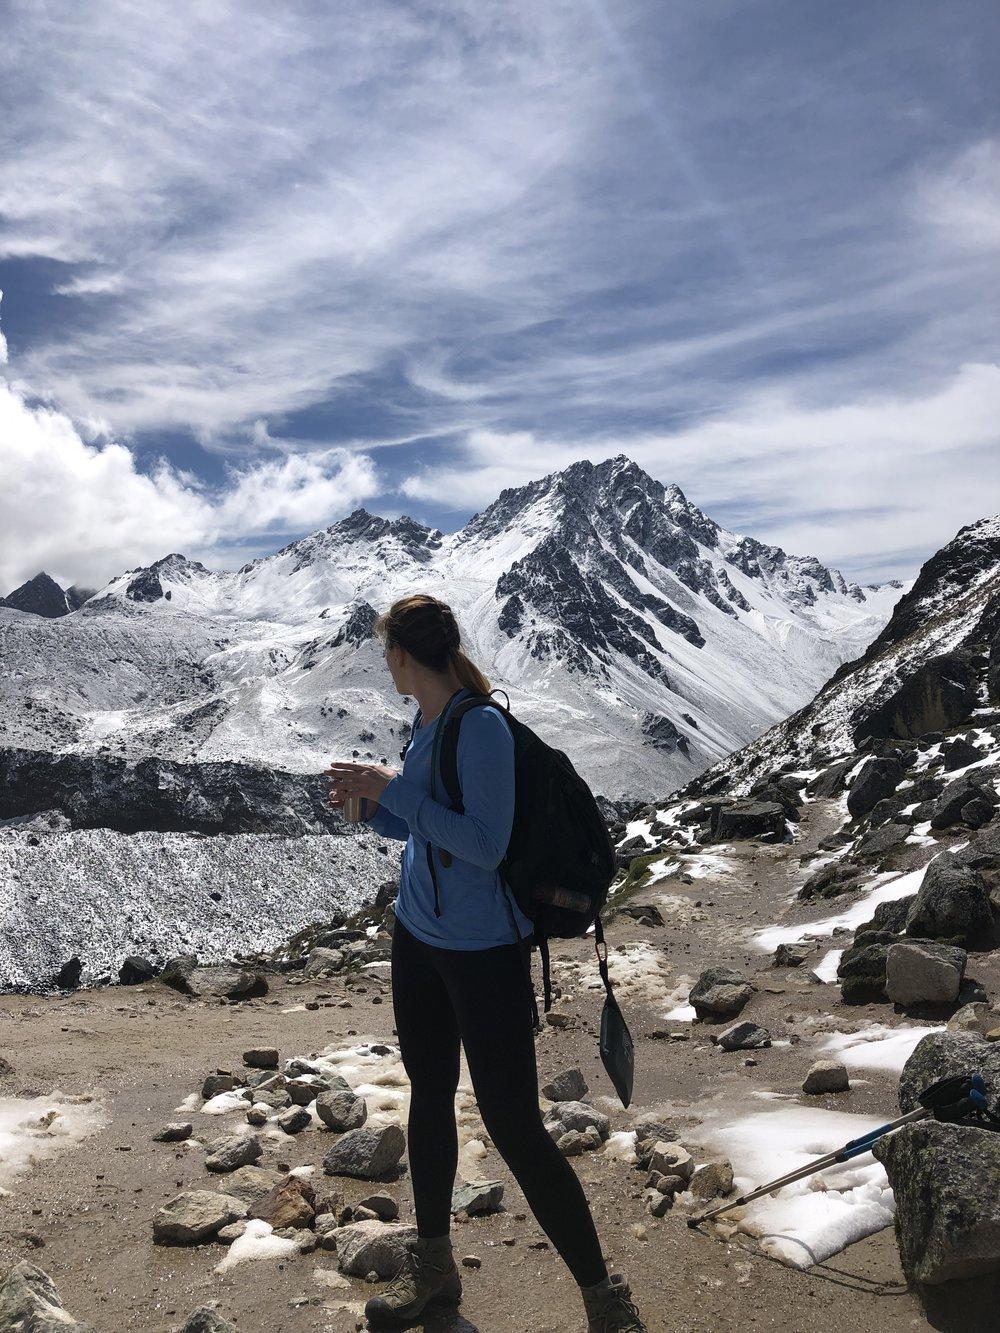 I did it! Salkantay Pass on day 2 of Salkantay Trek to Machu Picchu.